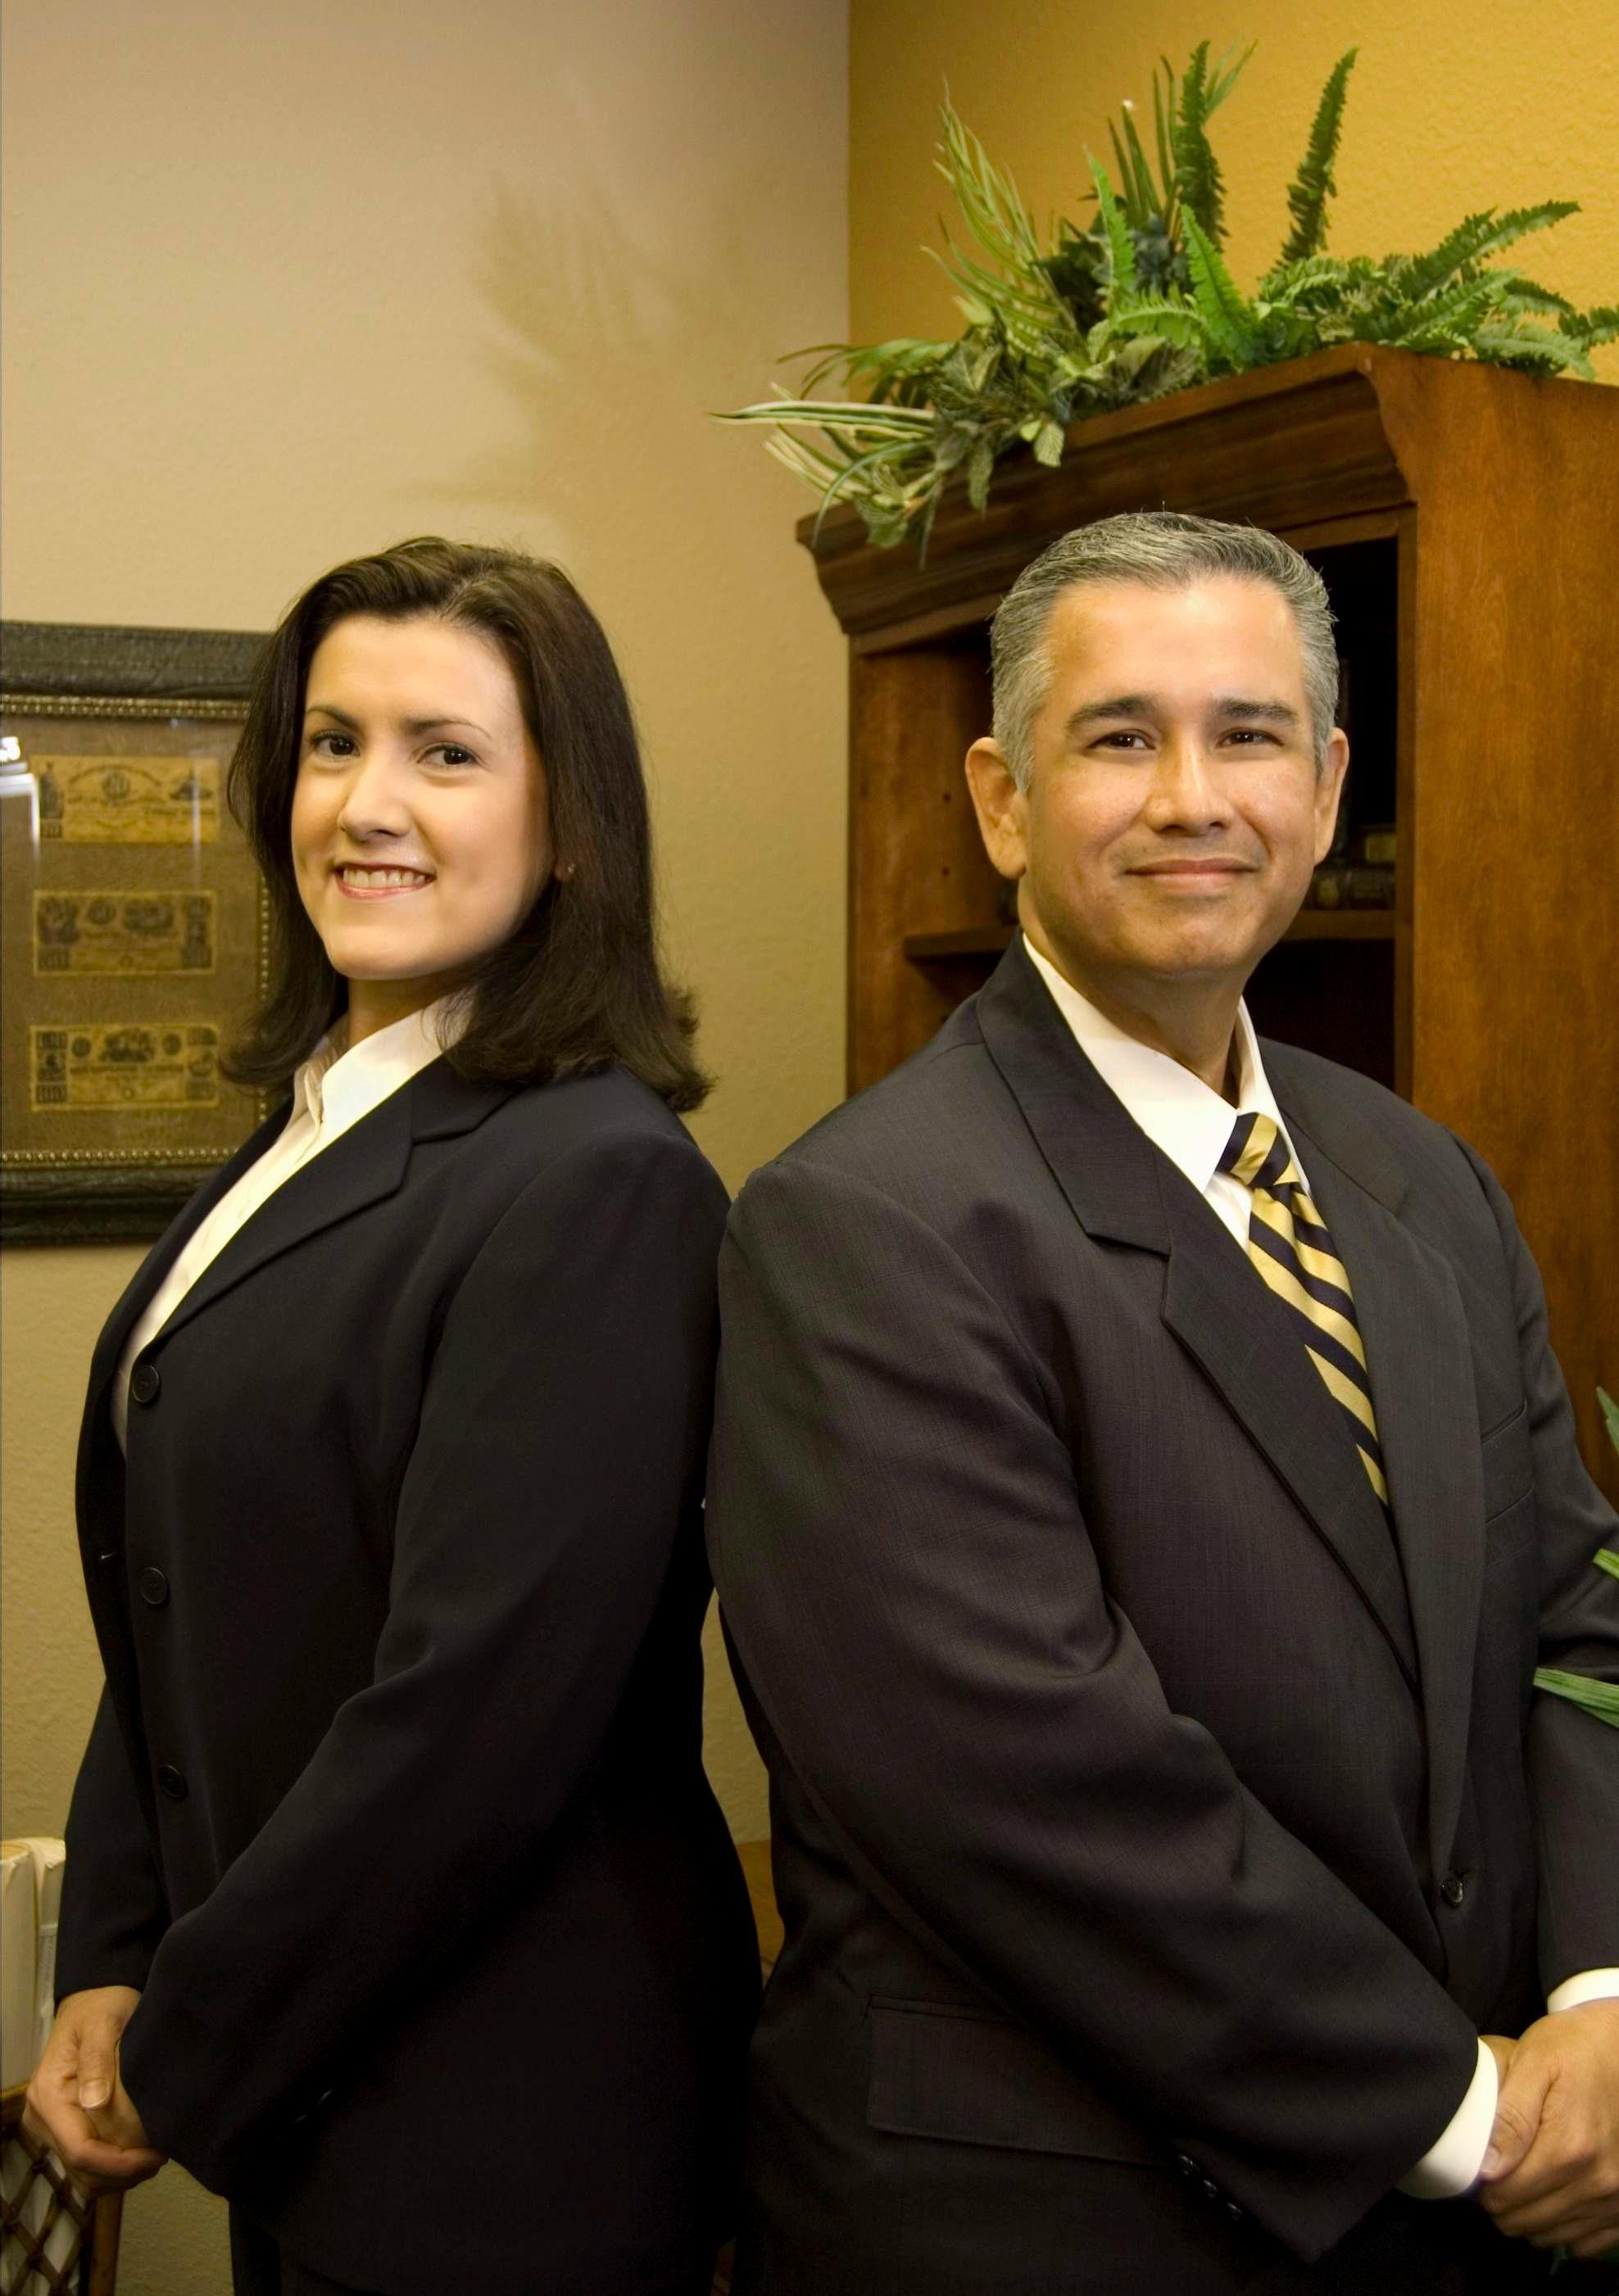 Joe Cuellar Home Loans - McAllen, TX 78504 - (956)789-2121 | ShowMeLocal.com